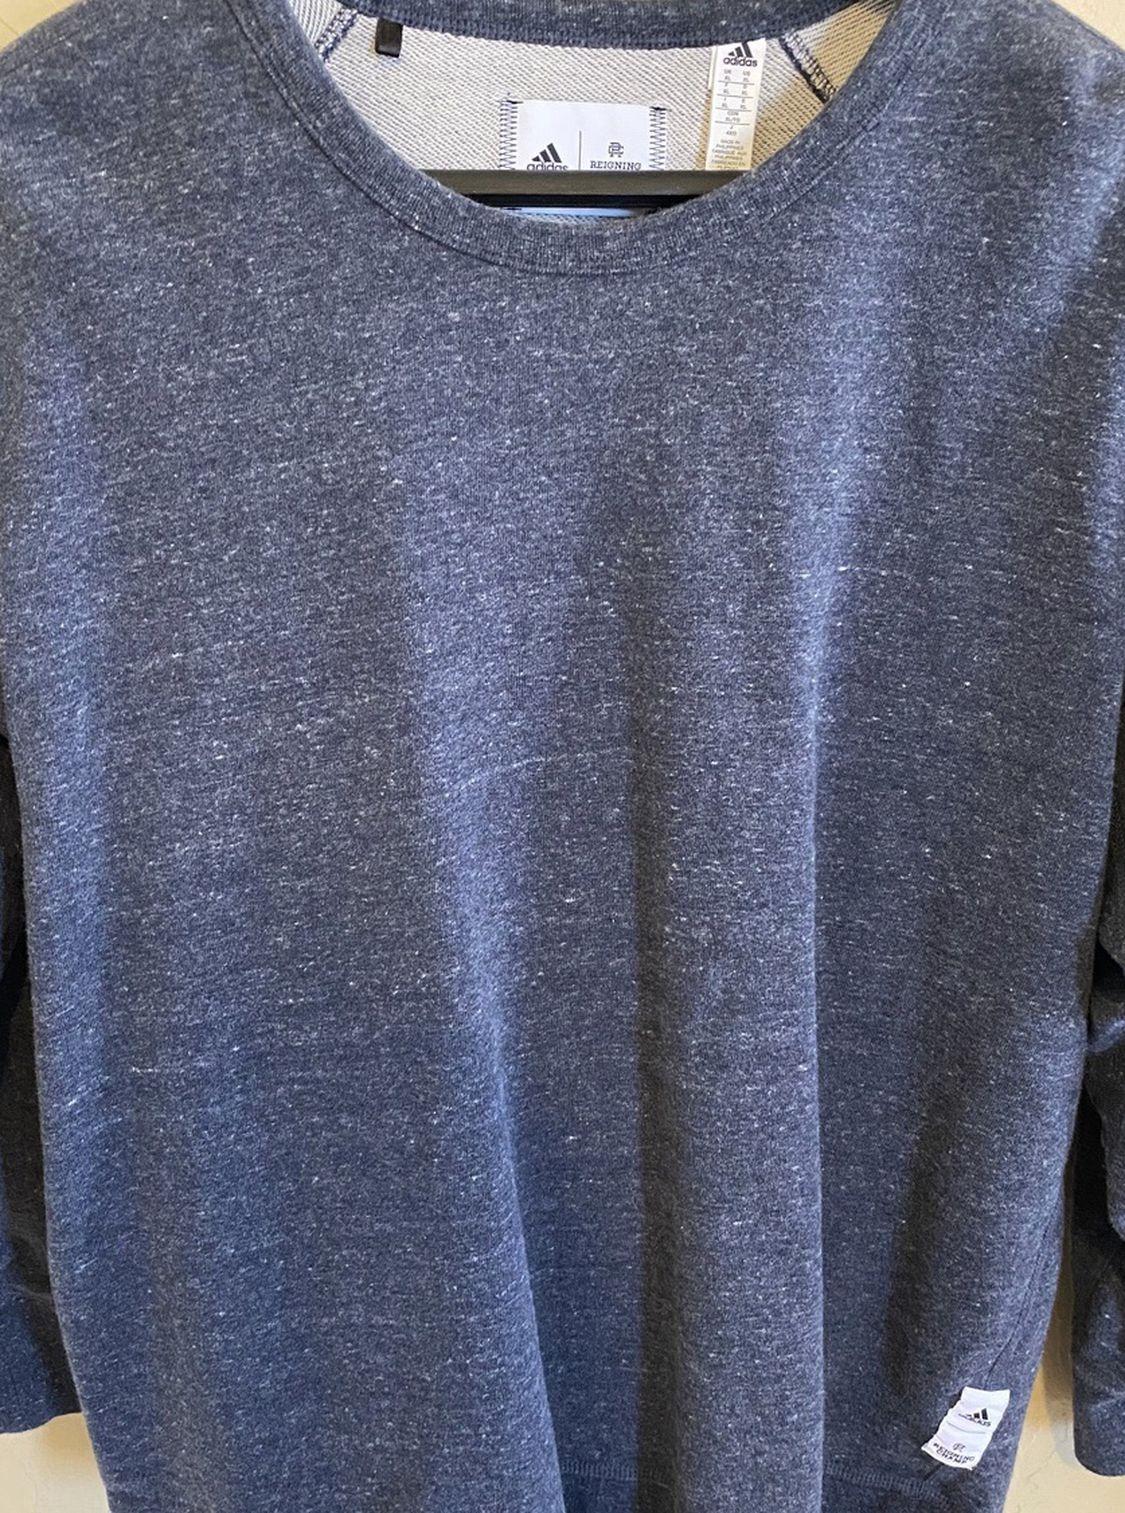 Reigning Champ X Adidas Crew Neck Sweater XL